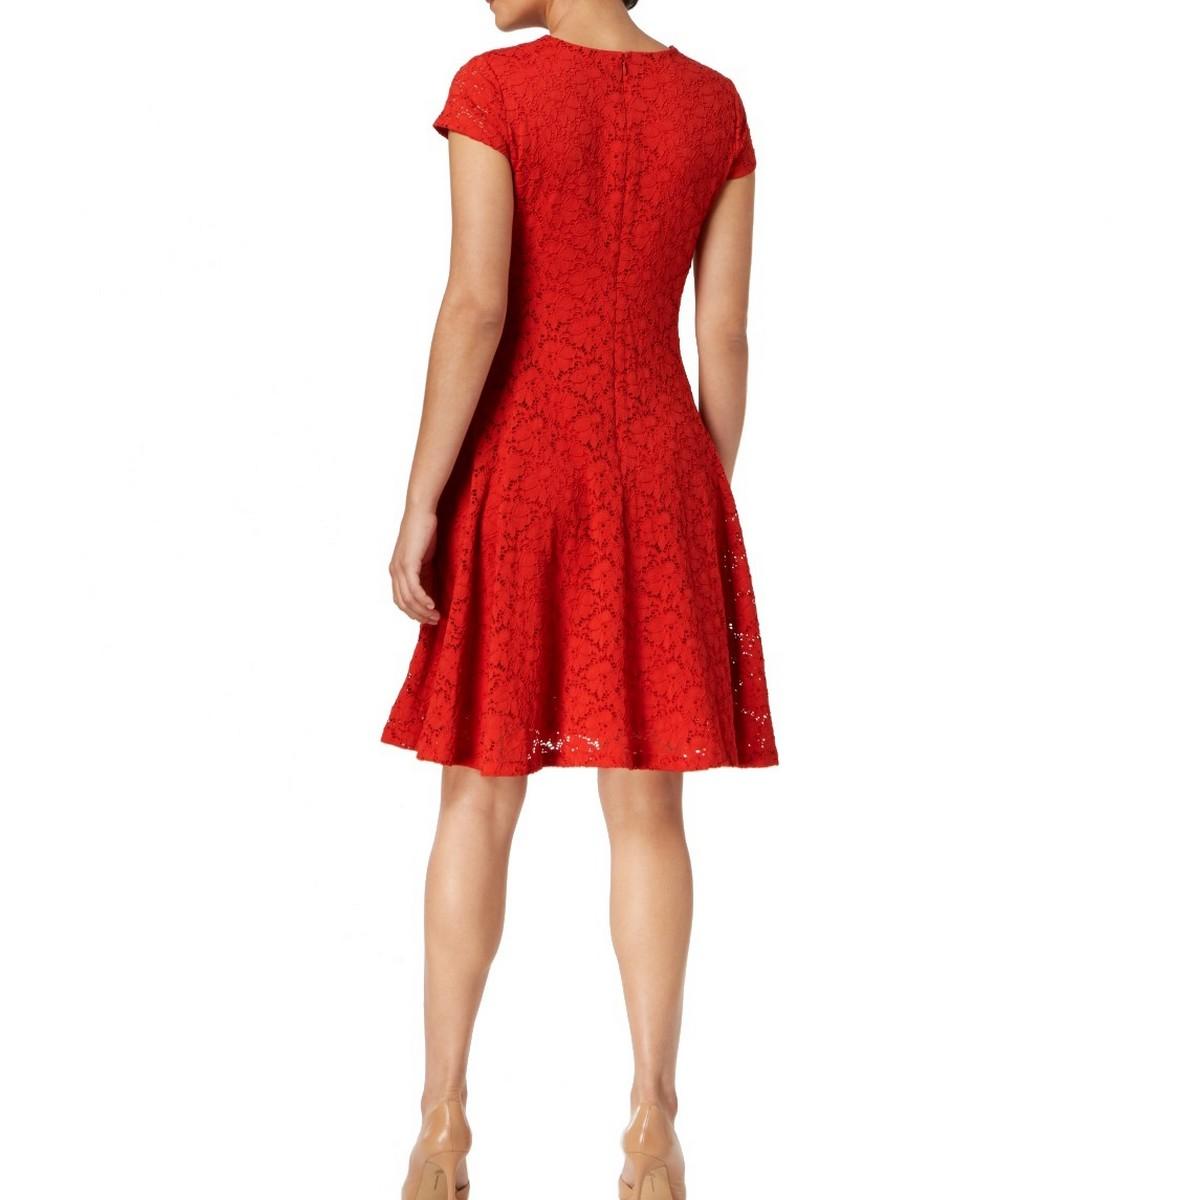 ALFANI-NEW-Women-039-s-Lace-Cap-Sleeves-Above-Knee-Fit-amp-Flare-Dress-TEDO thumbnail 4